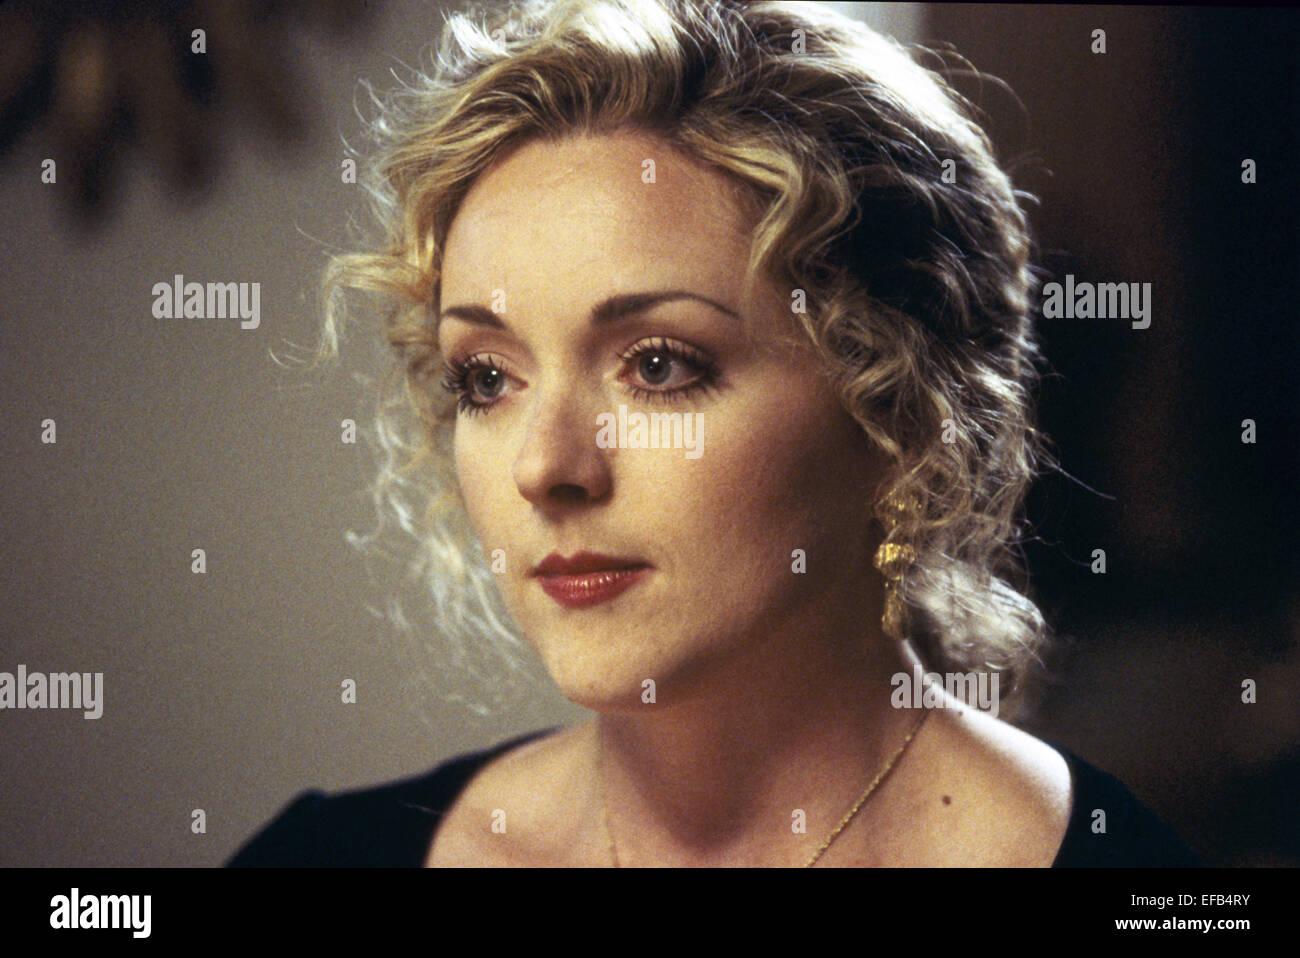 JANE KRAKOWSKI GO (1999) - Stock Image